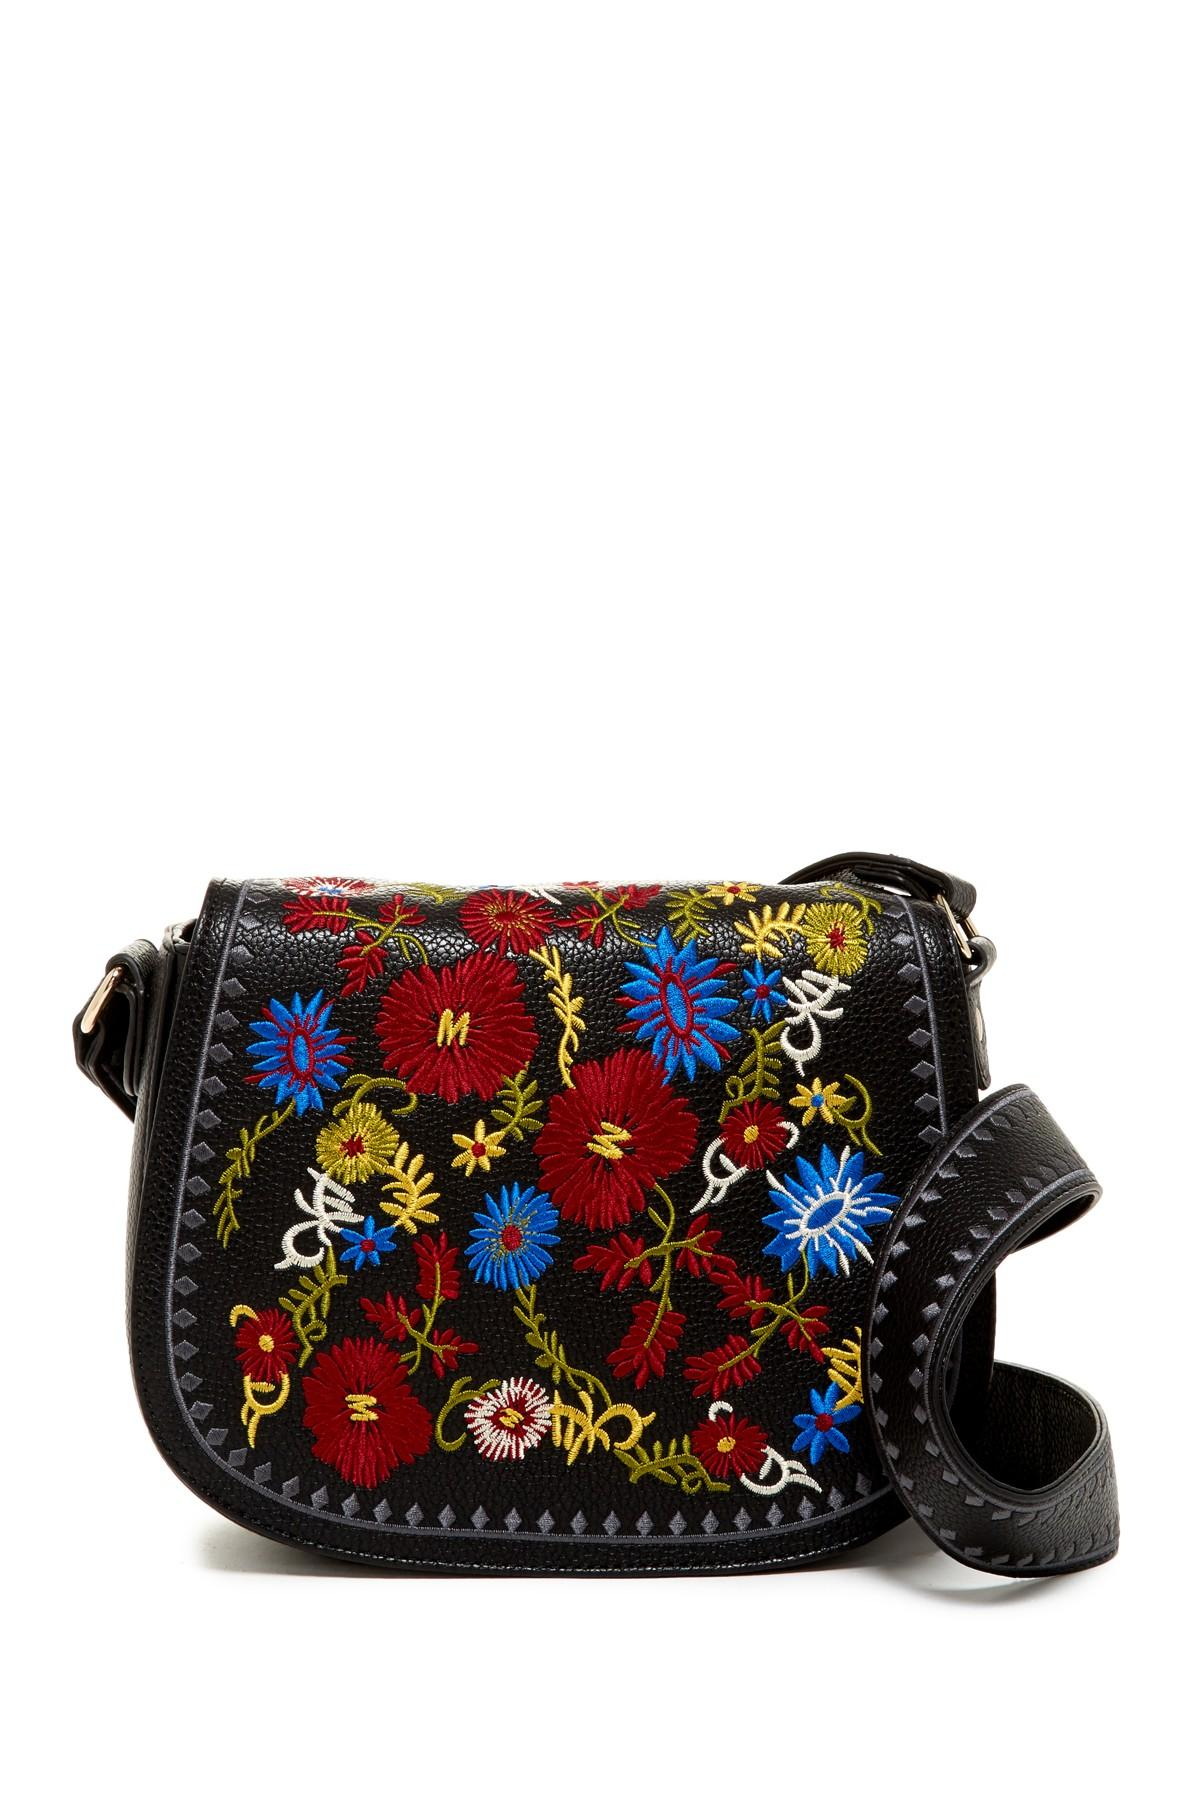 lyst steve madden bzuri embroidered saddle bag in black